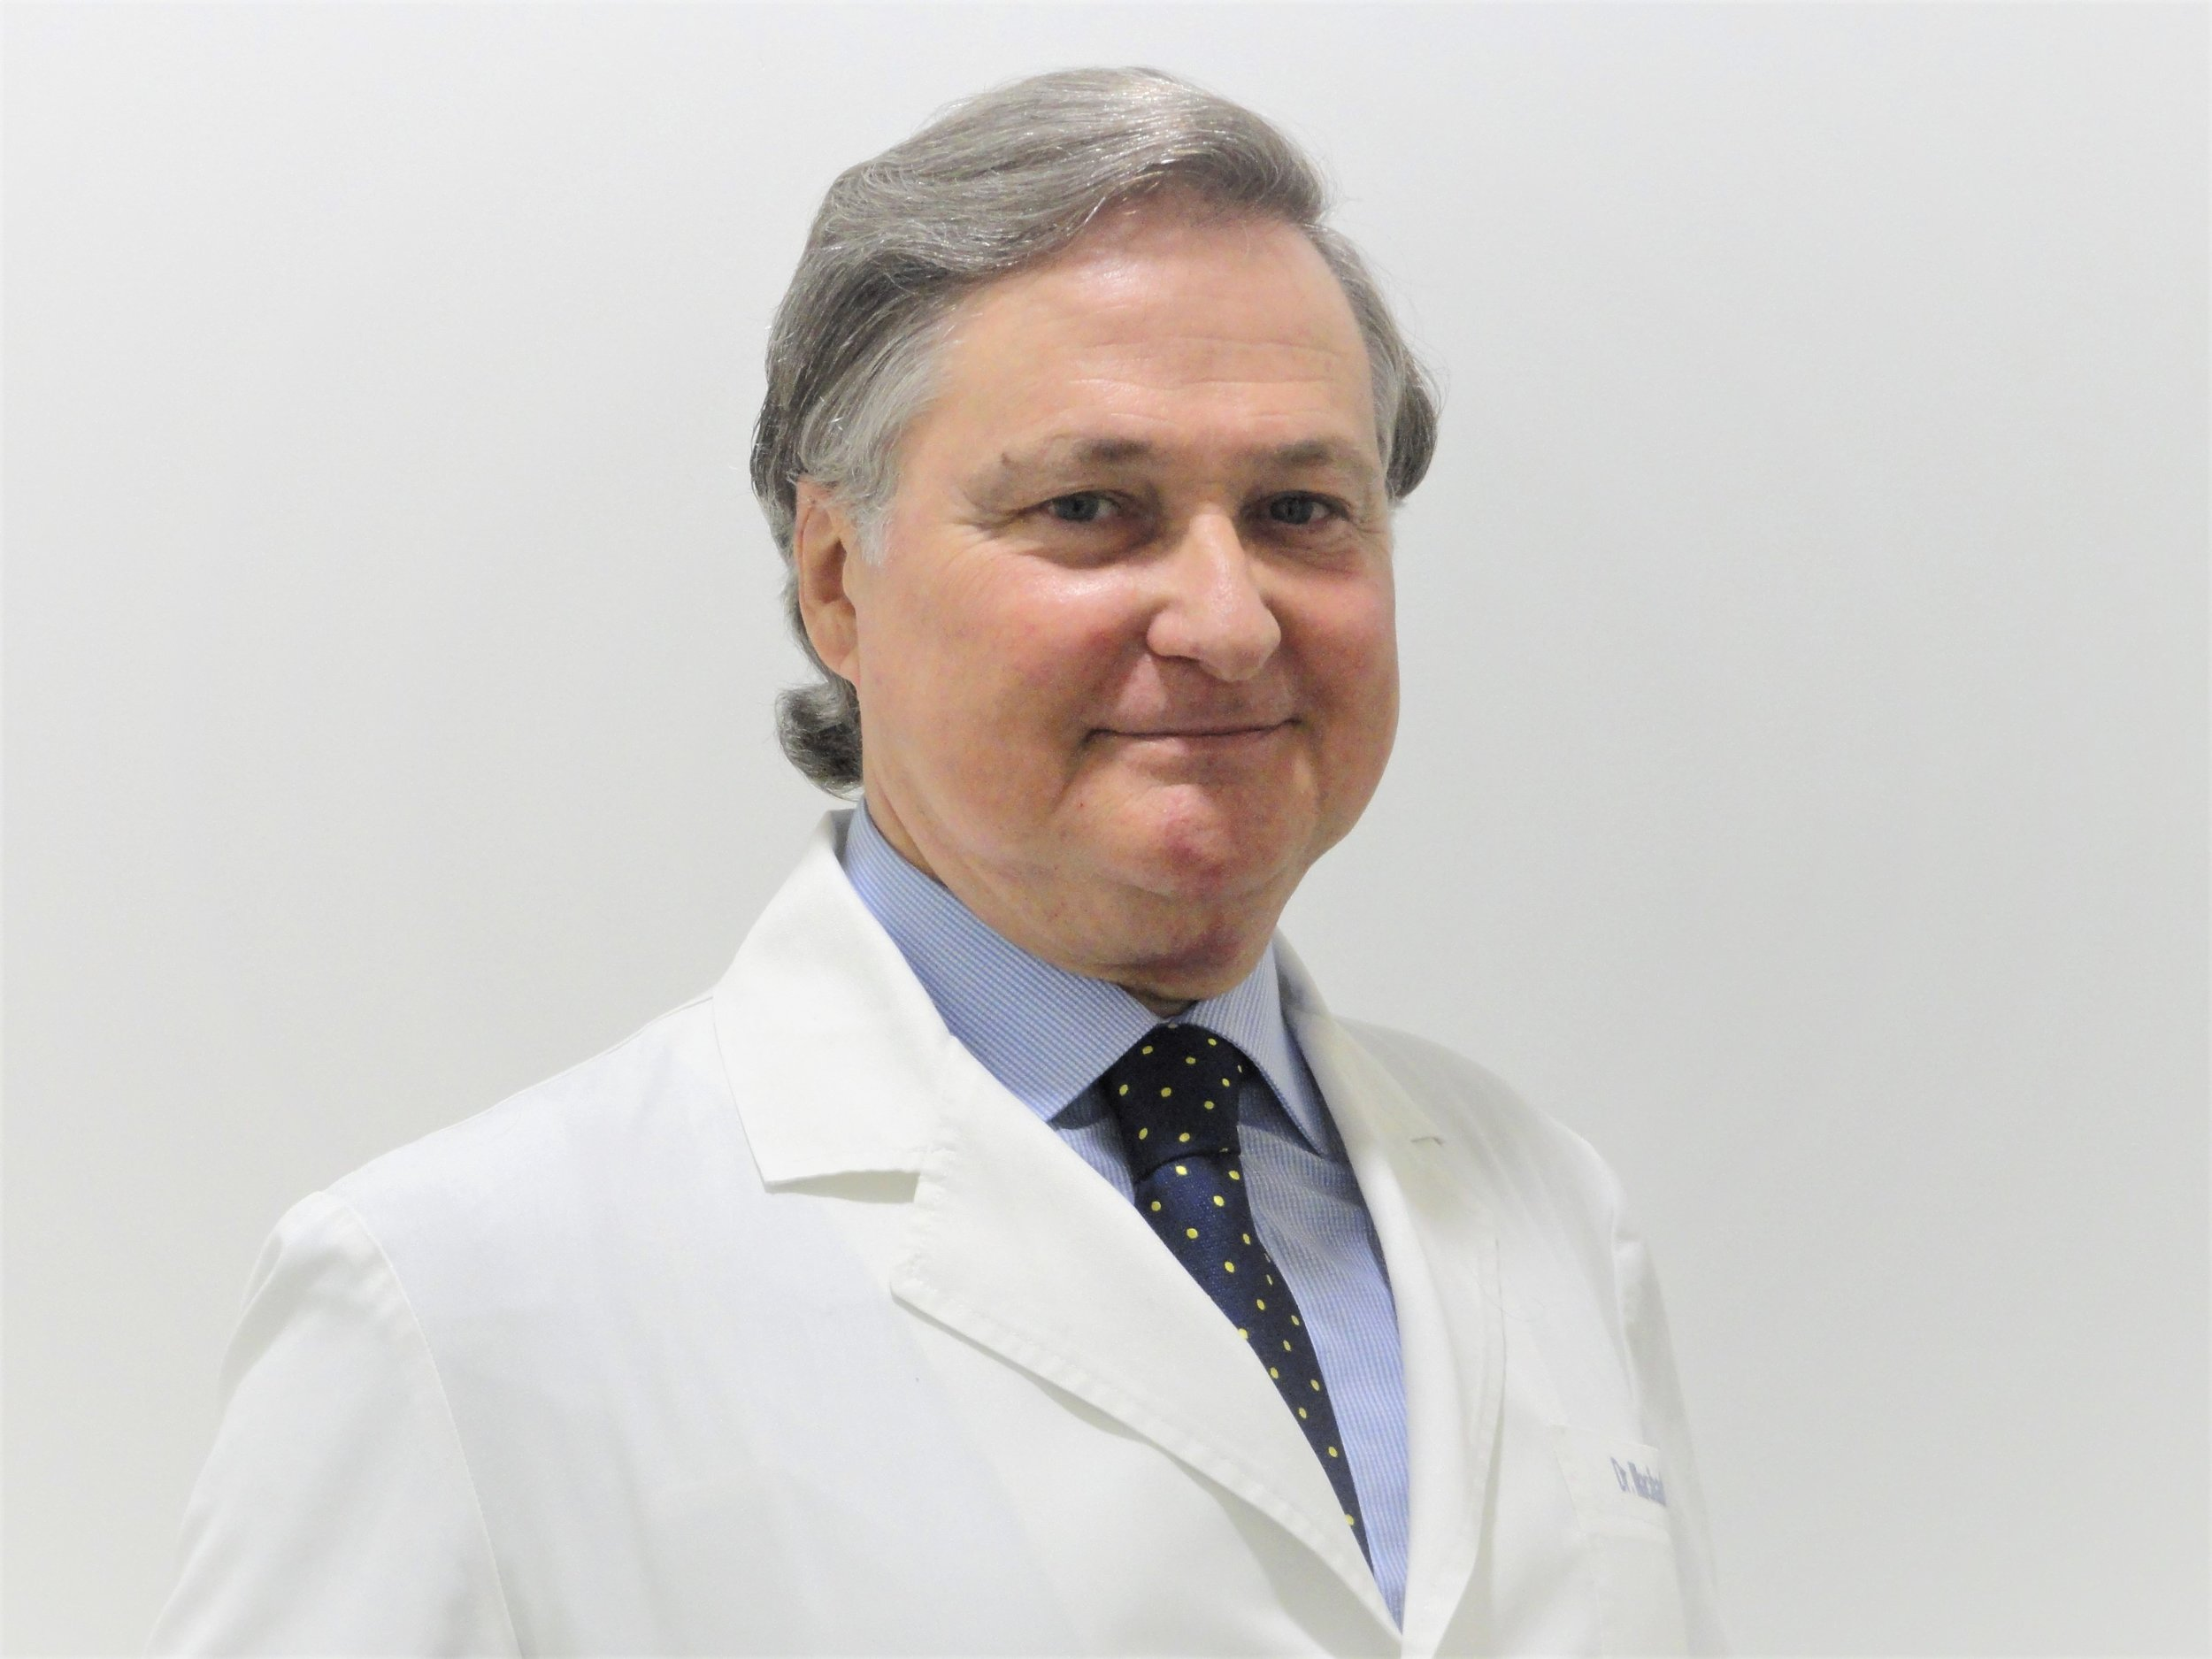 Dr. Vitor Machado Borges copia- Clínica Geral.jpg